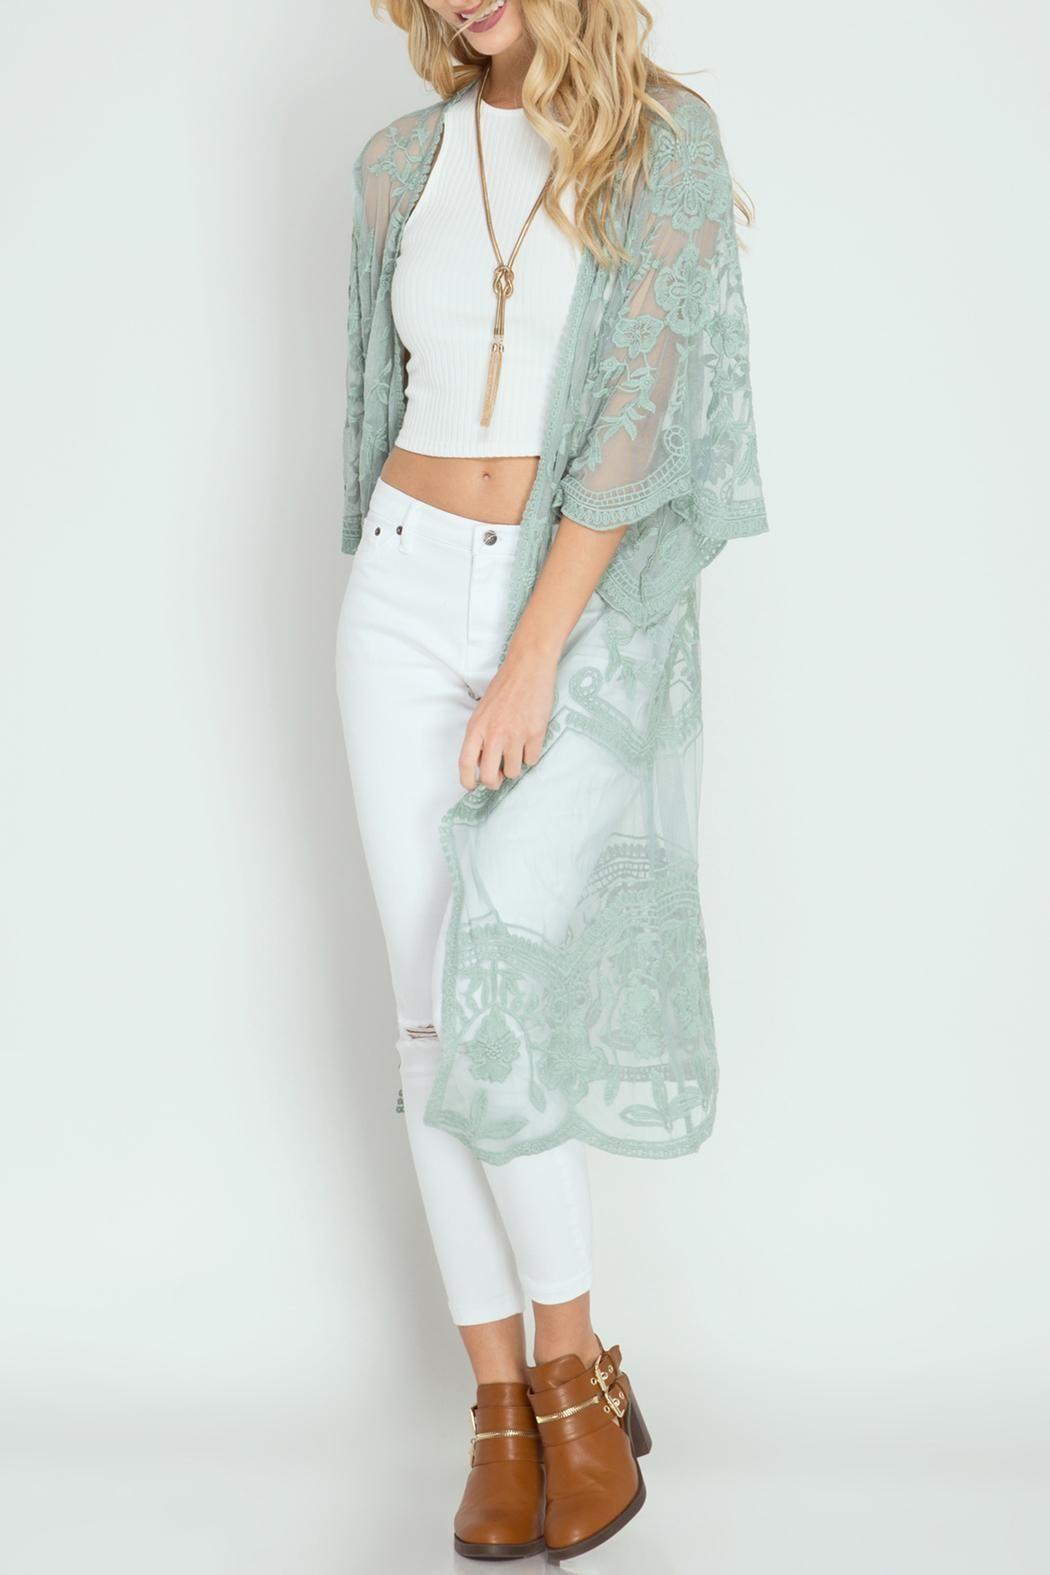 She   Sky Crochet Lace Duster | Sky clothing, Kimono style and ...